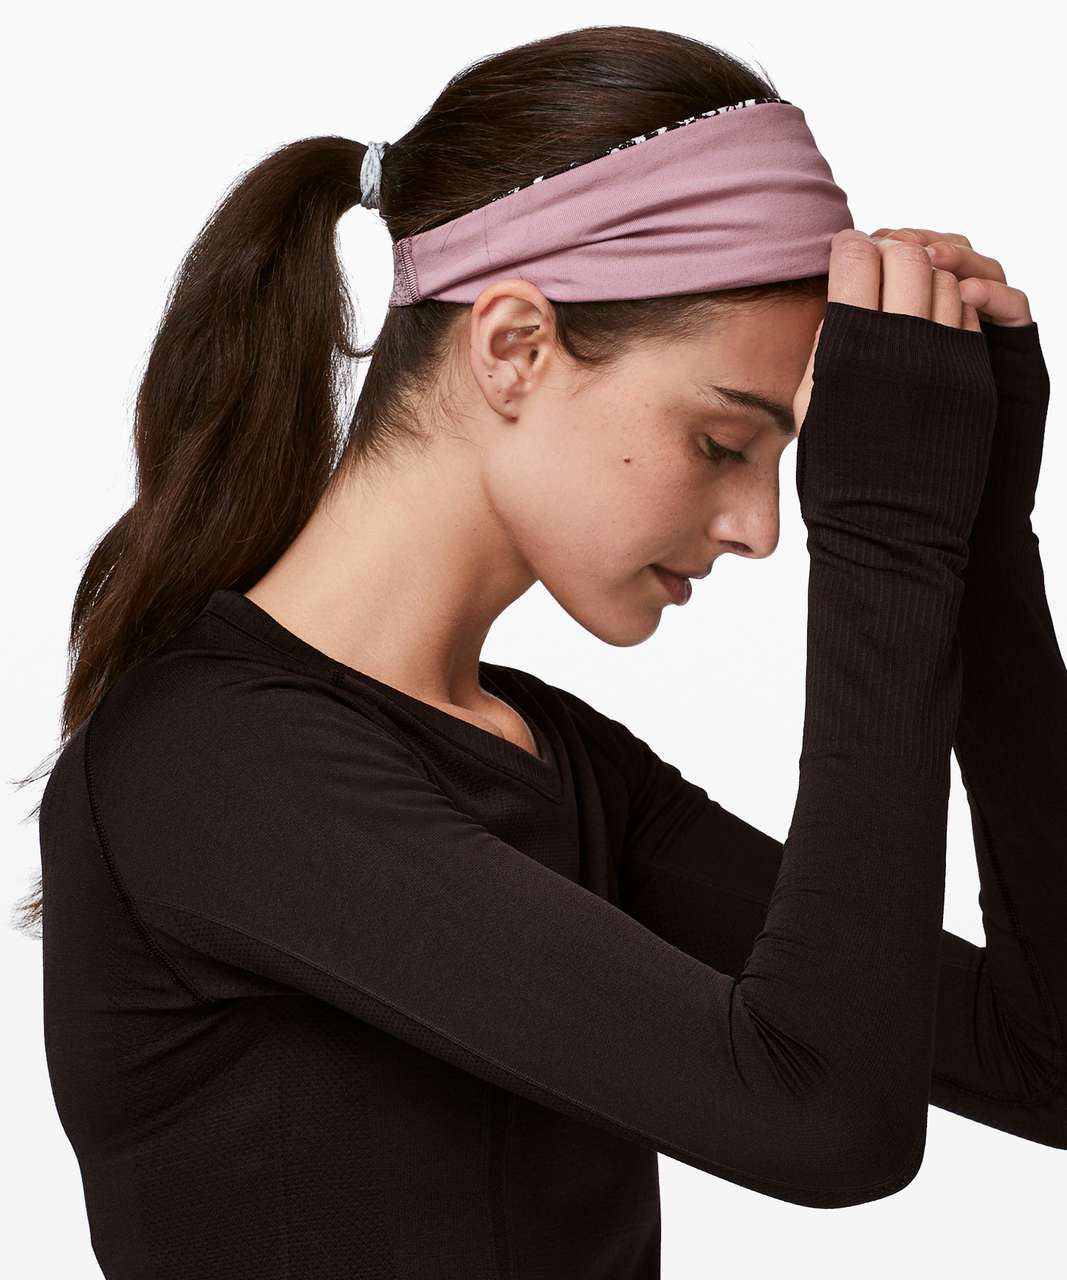 Lululemon Fringe Fighter Headband - Floral Spritz Multi / Vintage Mauve